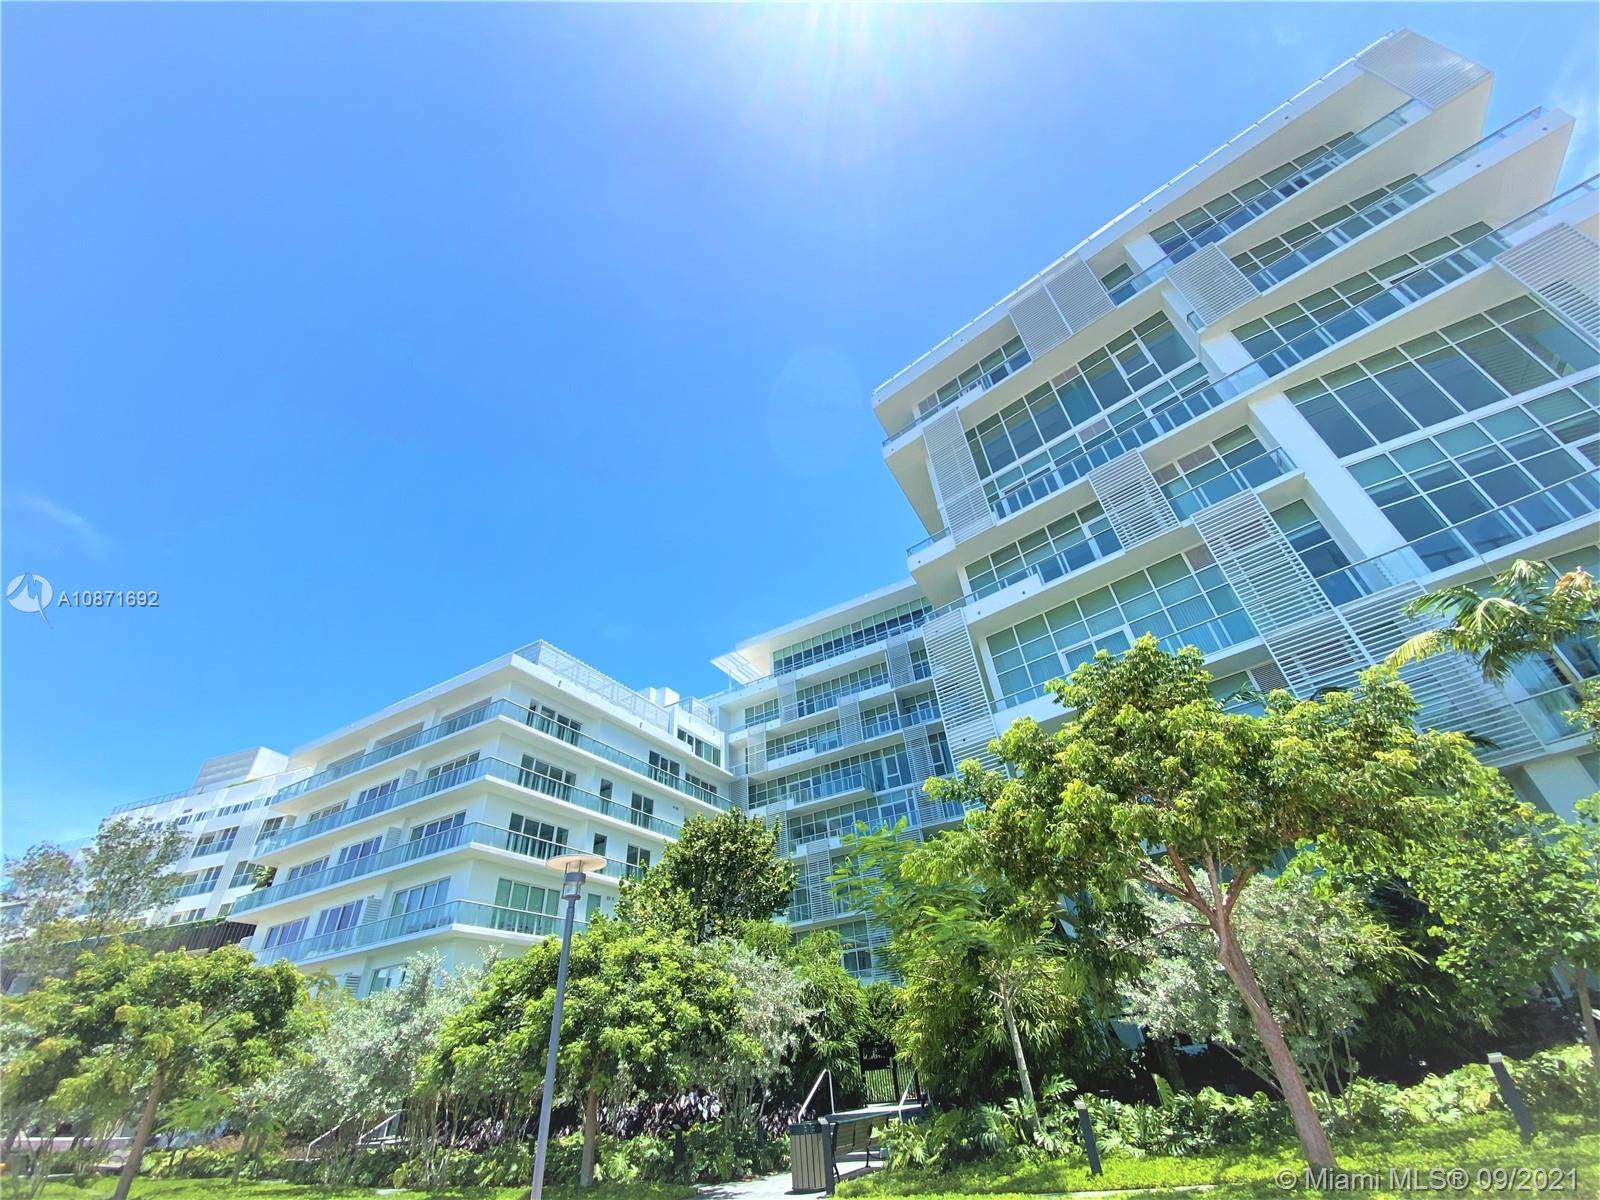 4701 Meridian avenue-427 miami-beach-fl-33140-a10871692-Pic01